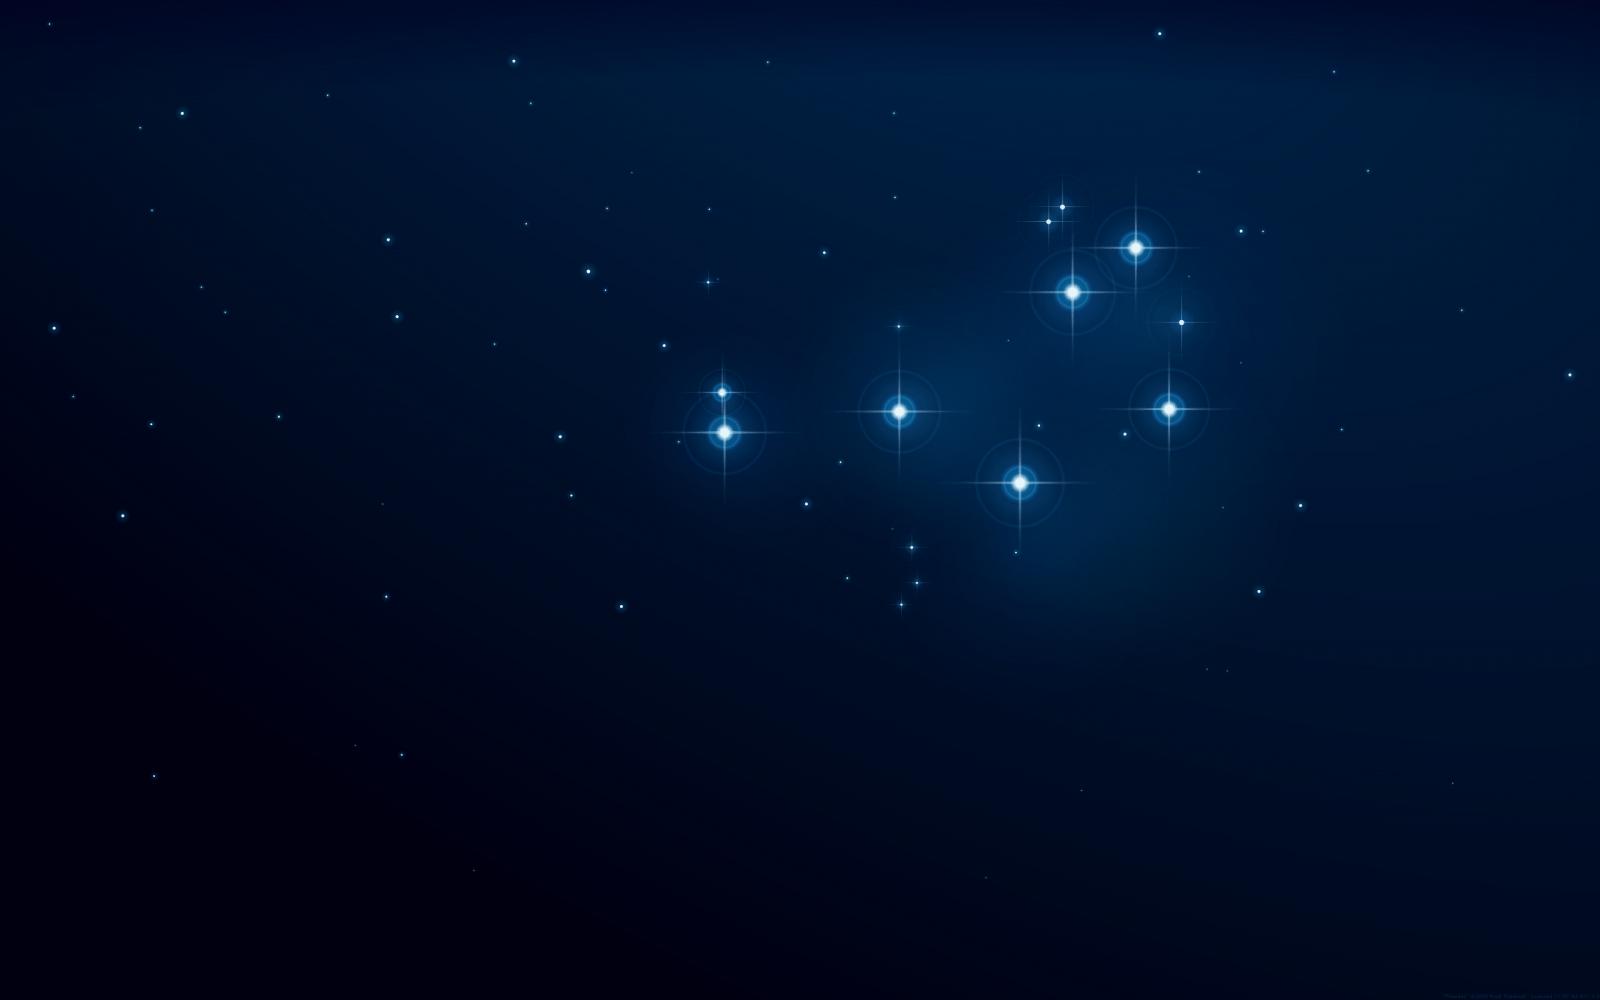 subaru star constellation